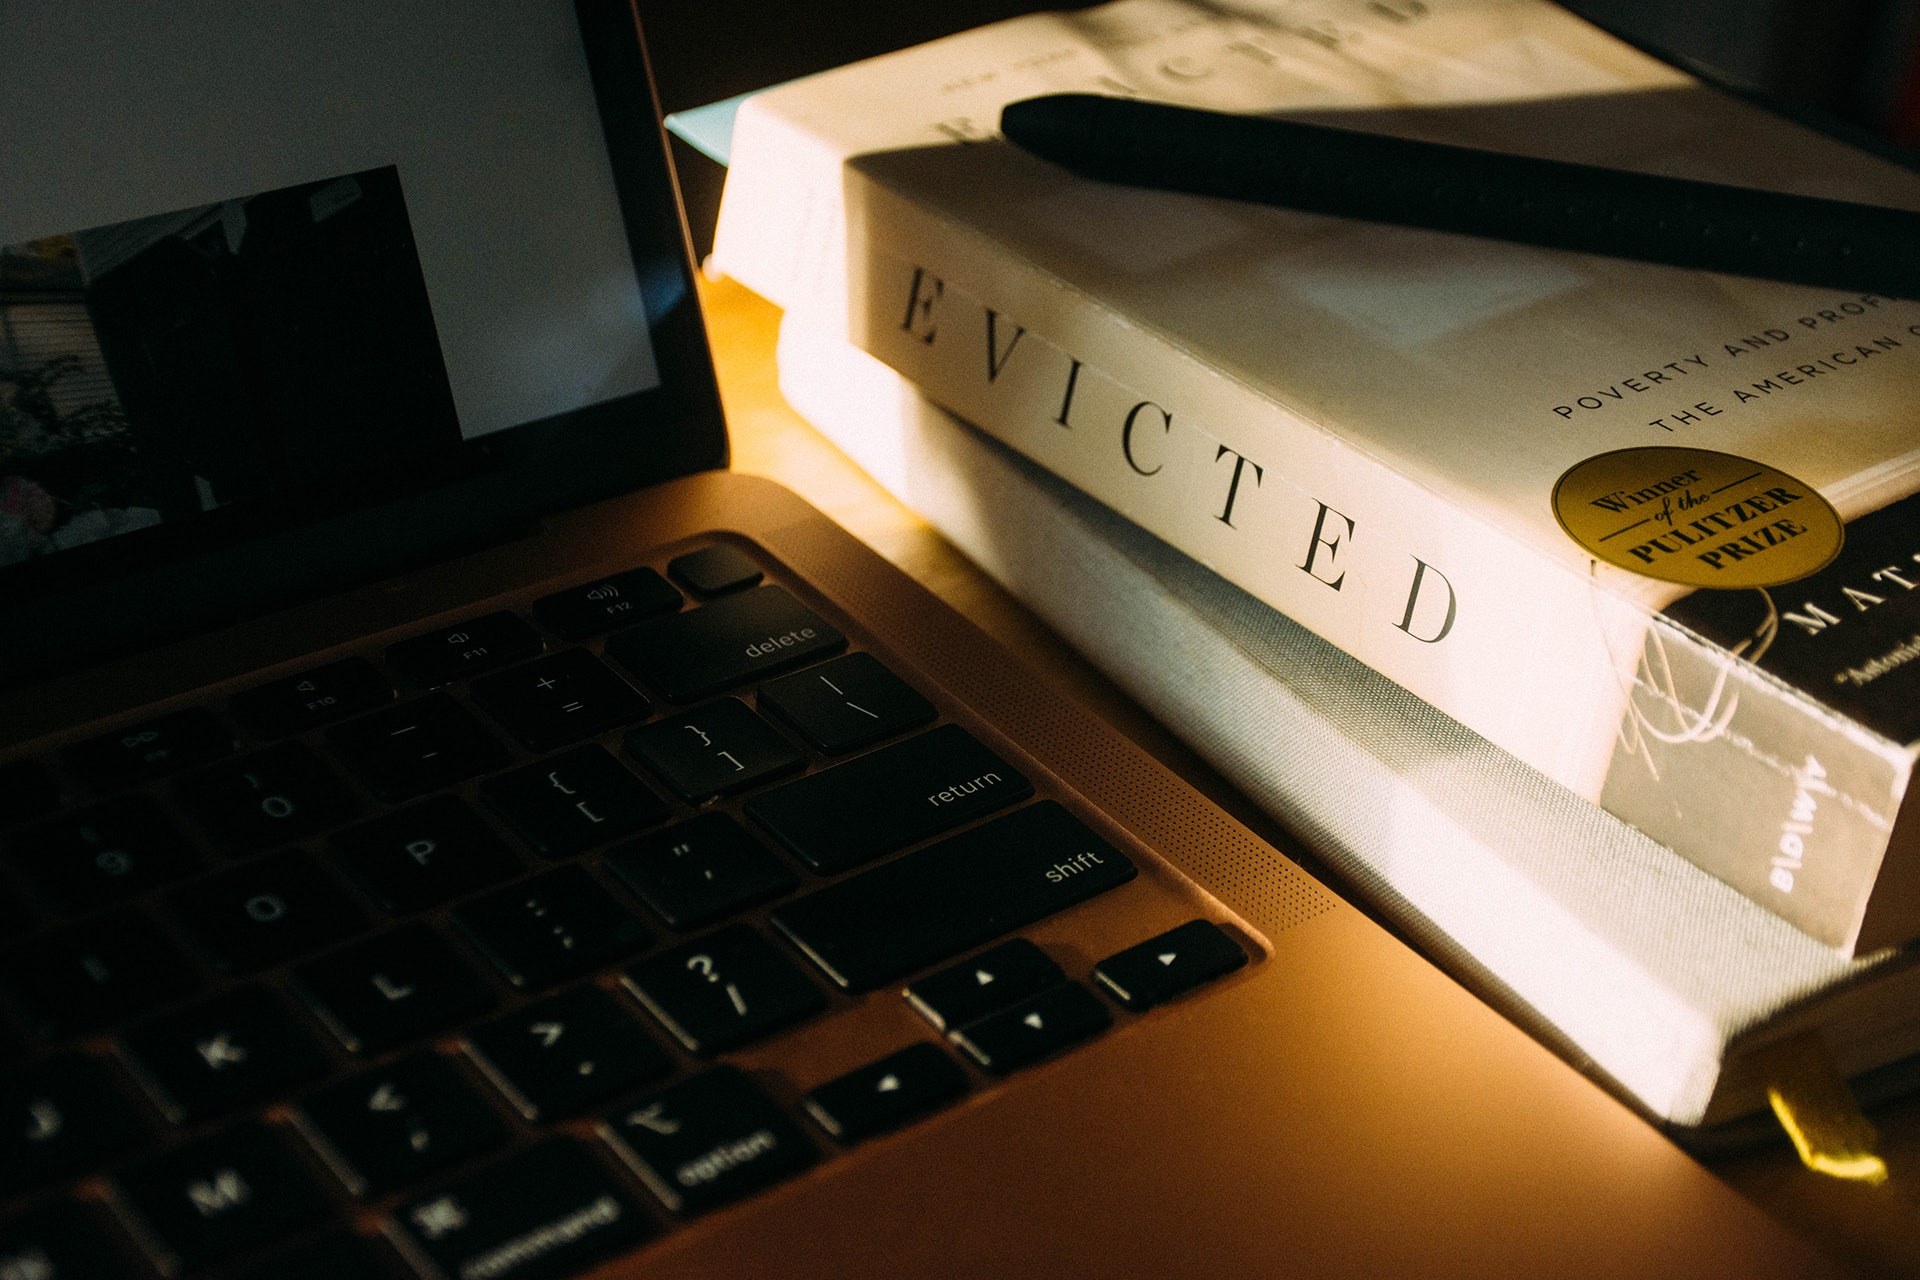 Access Ventures Goodreads Bookshelf Blog Post Cover Photo